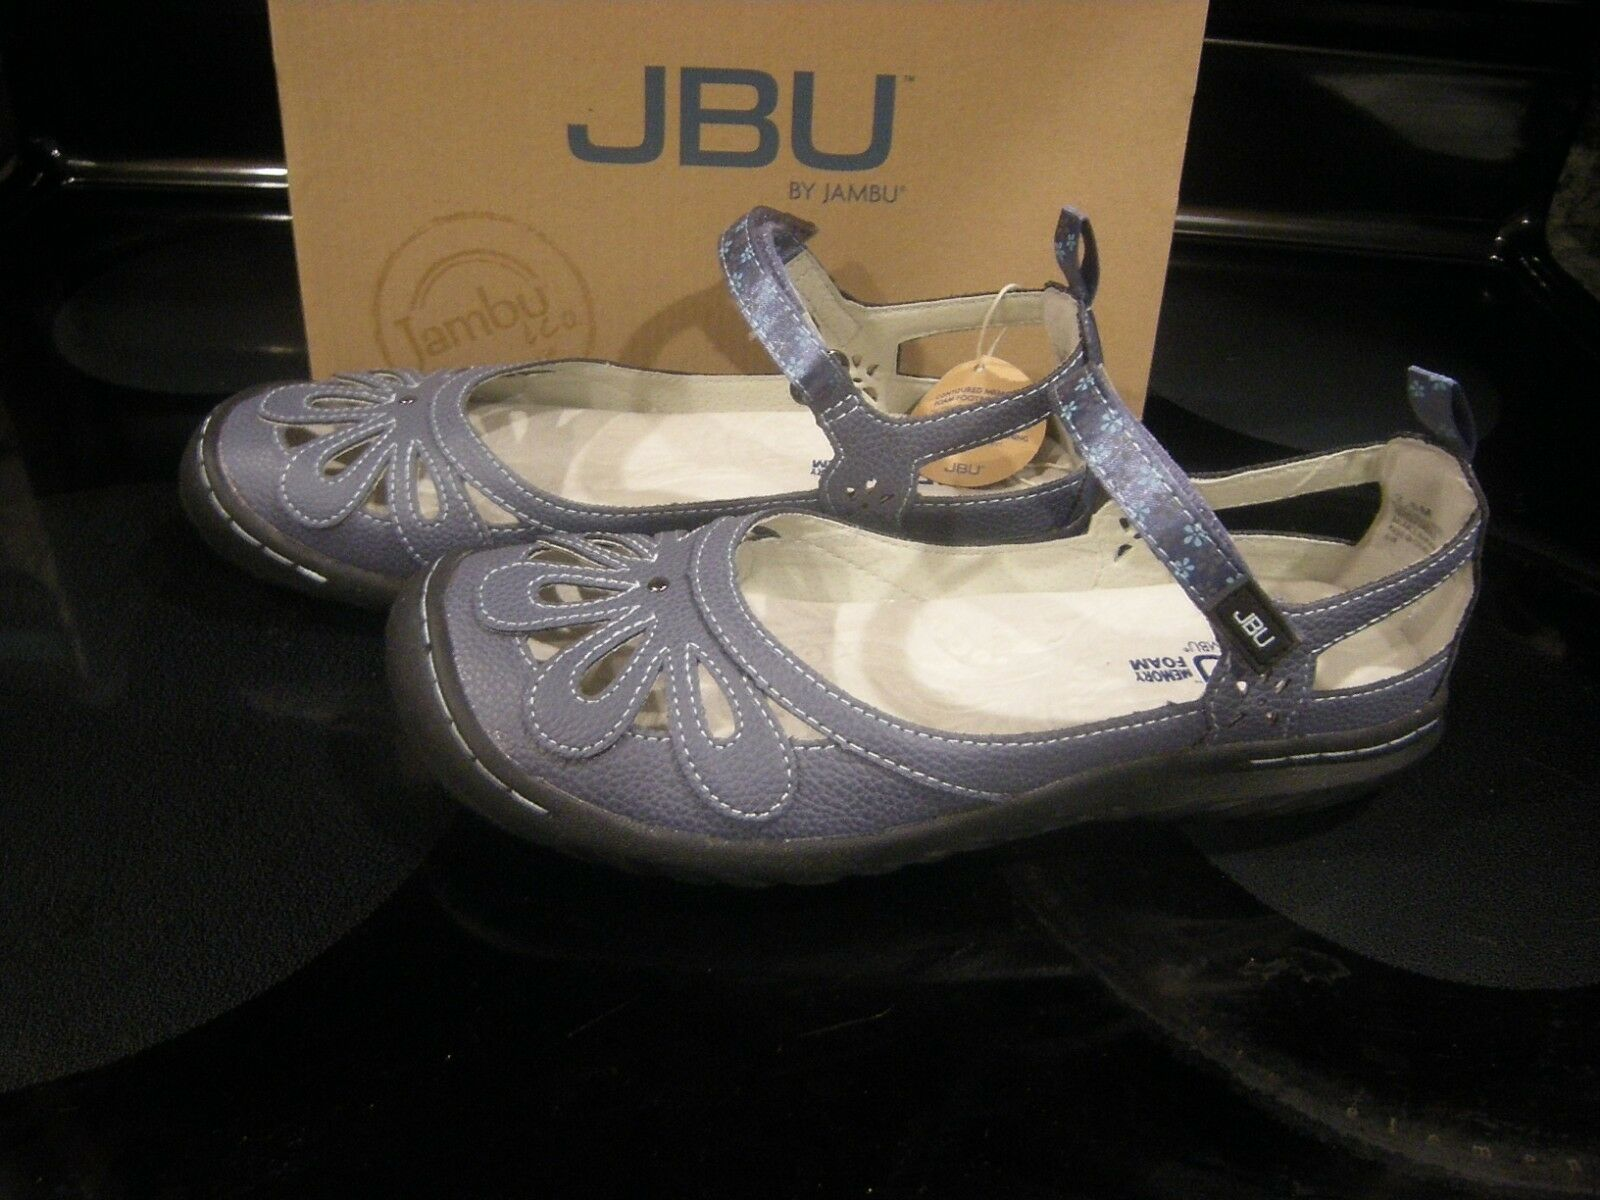 New Womens Denim JBU By Jambu Wildflower shoes, 7.5 M